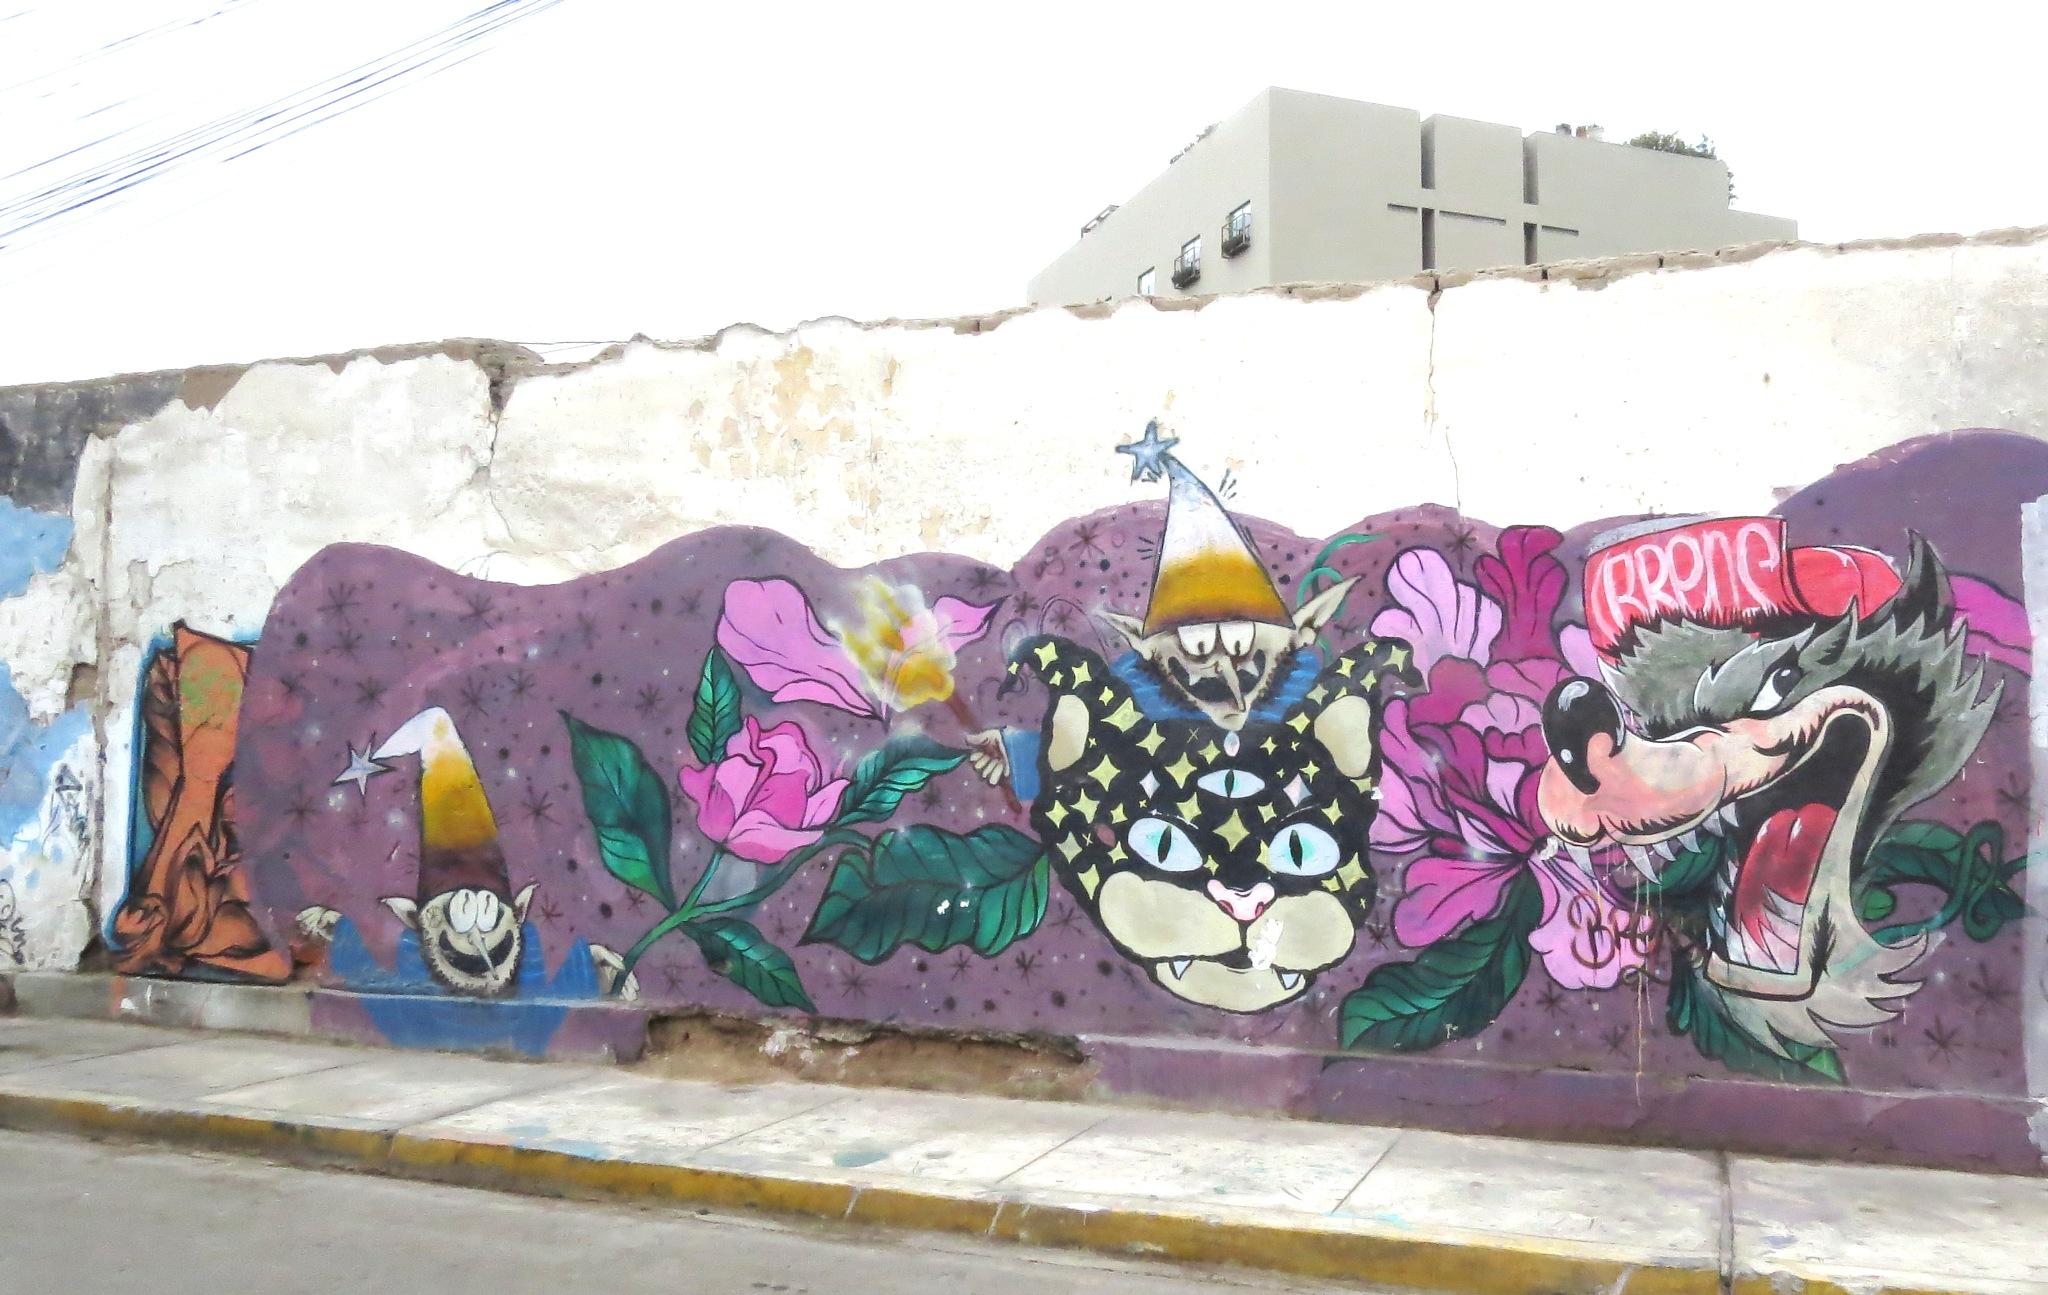 graffitti by Cesar Panizo